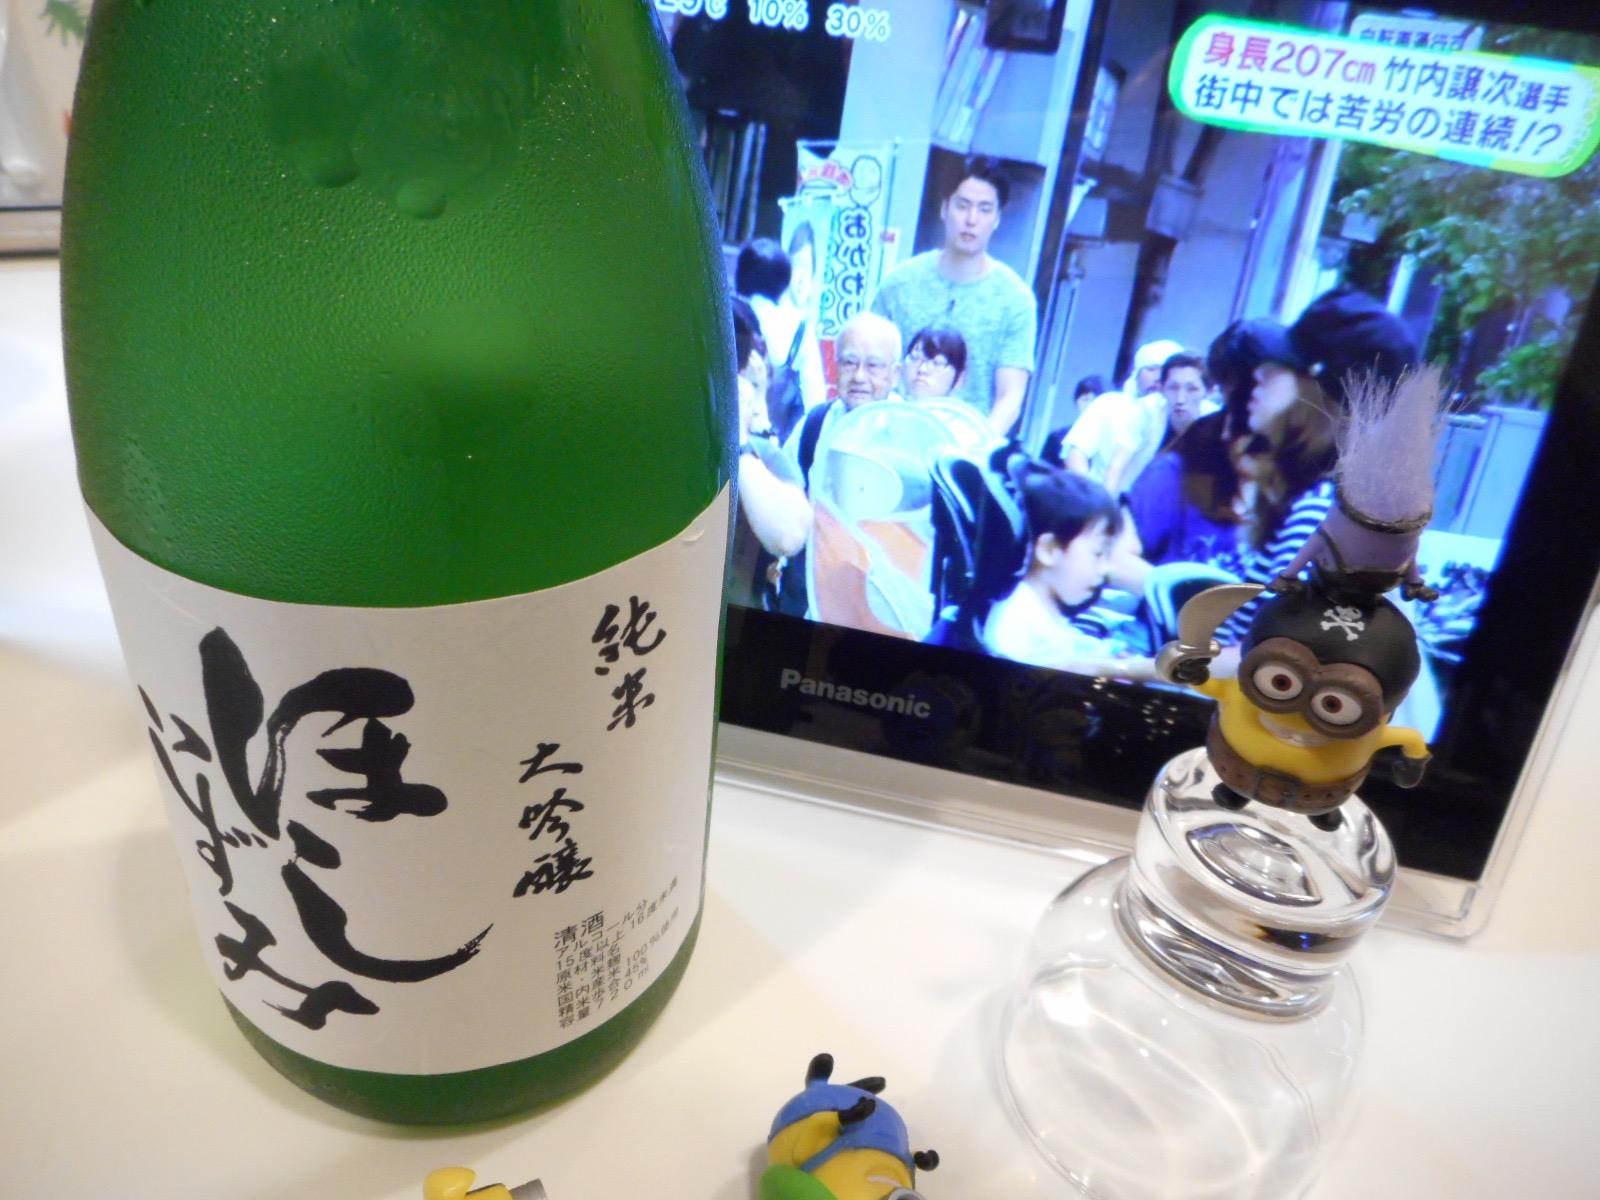 hoshiizumi_jundai_yamada45_27by4.jpg